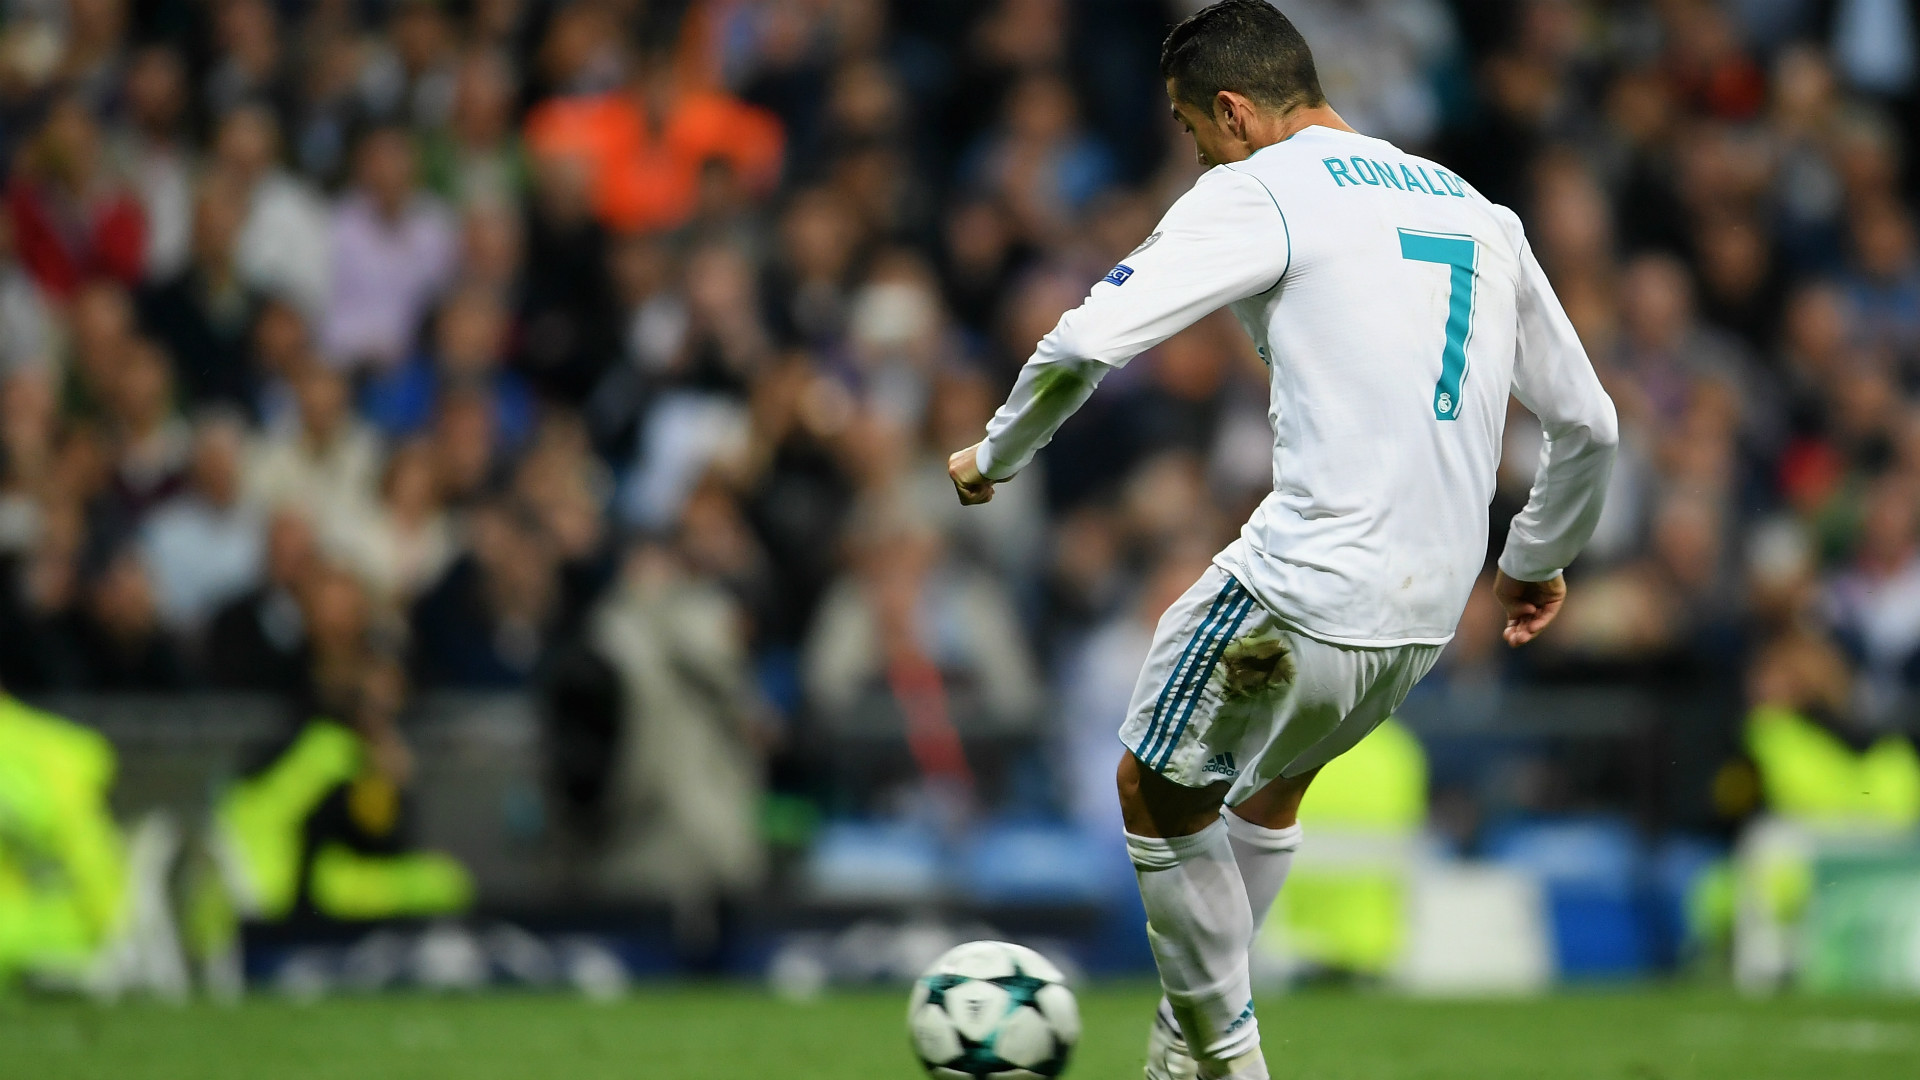 REAL MADRID TOTTENHAM CHAMPIONS LEAGUE